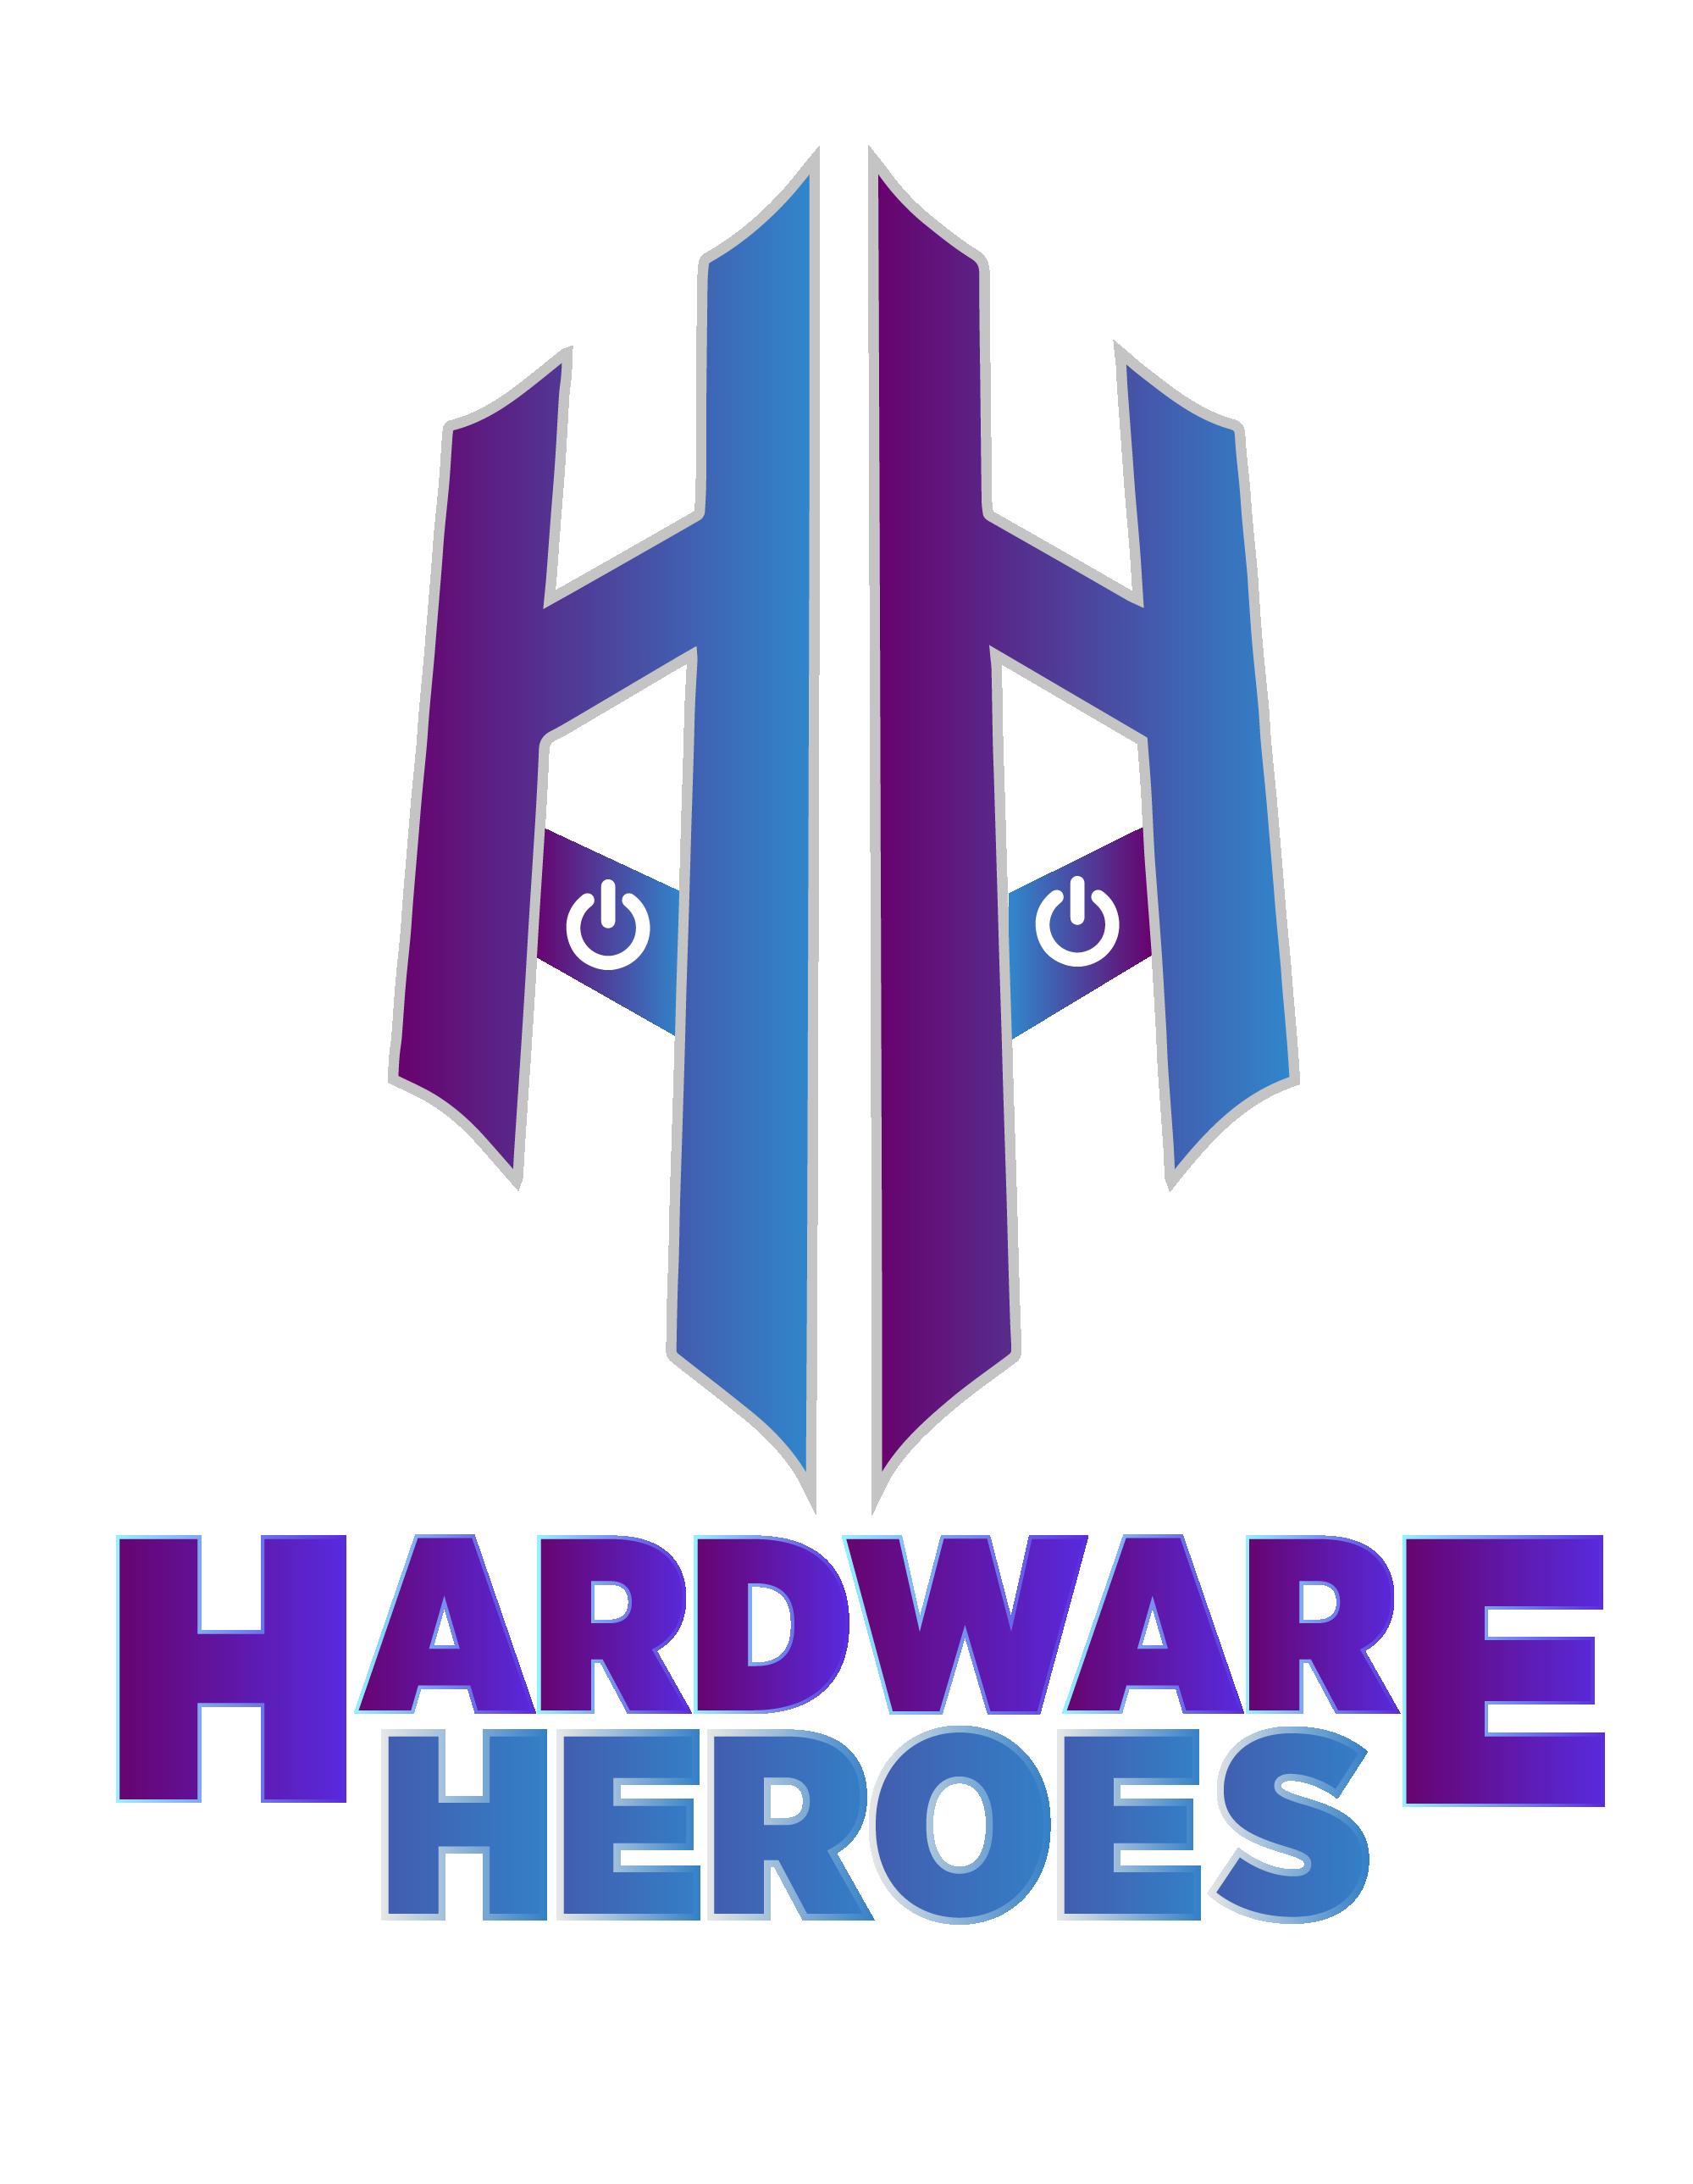 Hardware Heroes